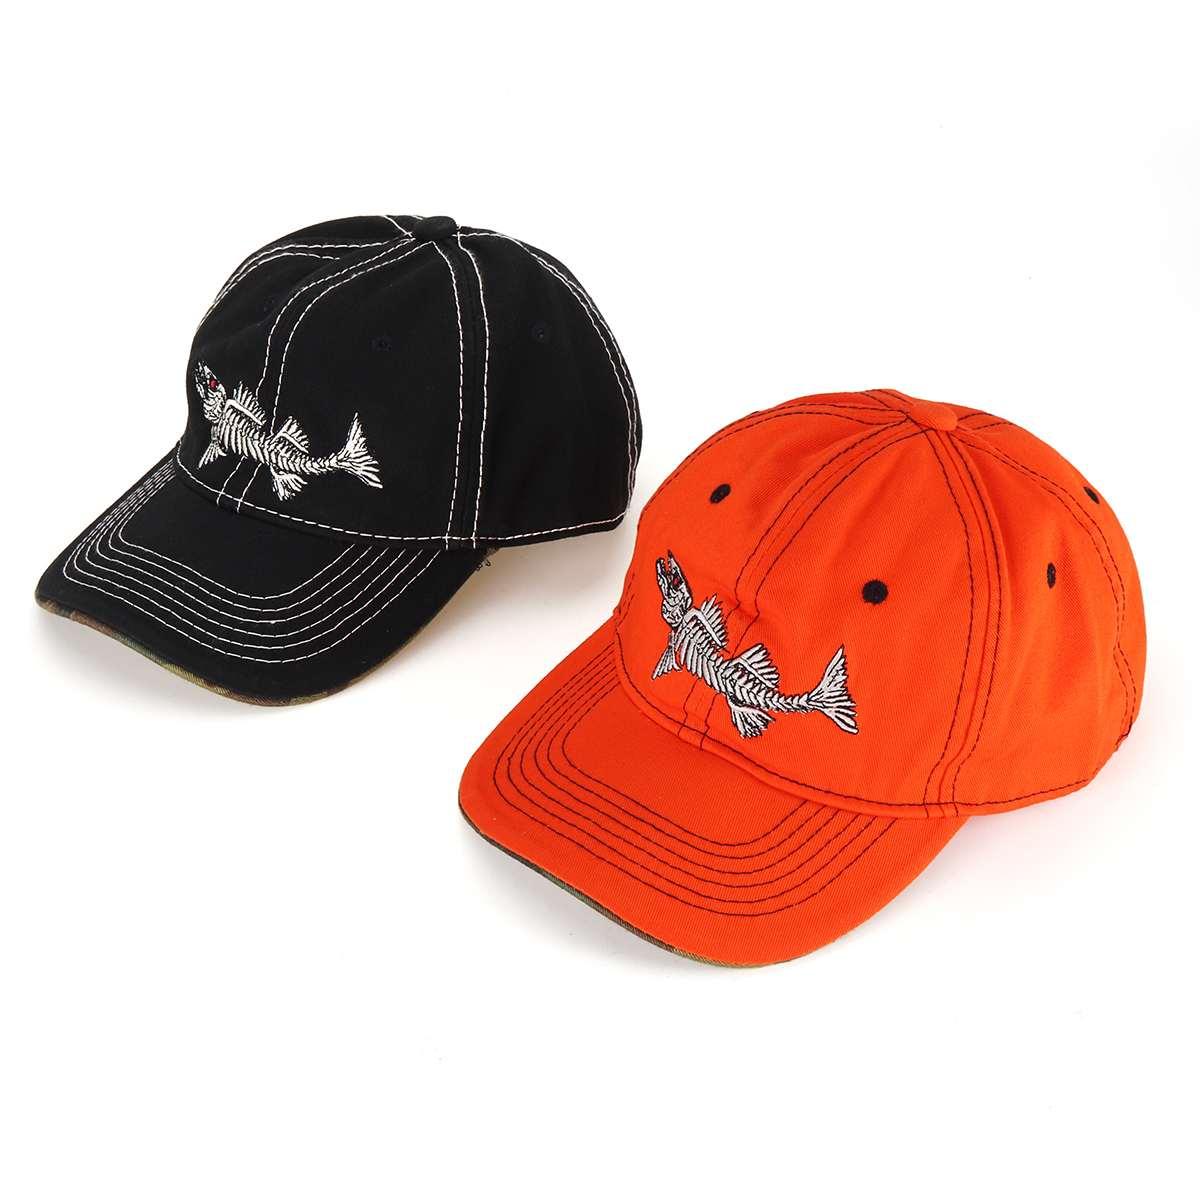 Black / Orange Color Mens Hat Embroidery Fish Unisex Women Men Hats   Baseball     Cap   Snapback Casual   Caps